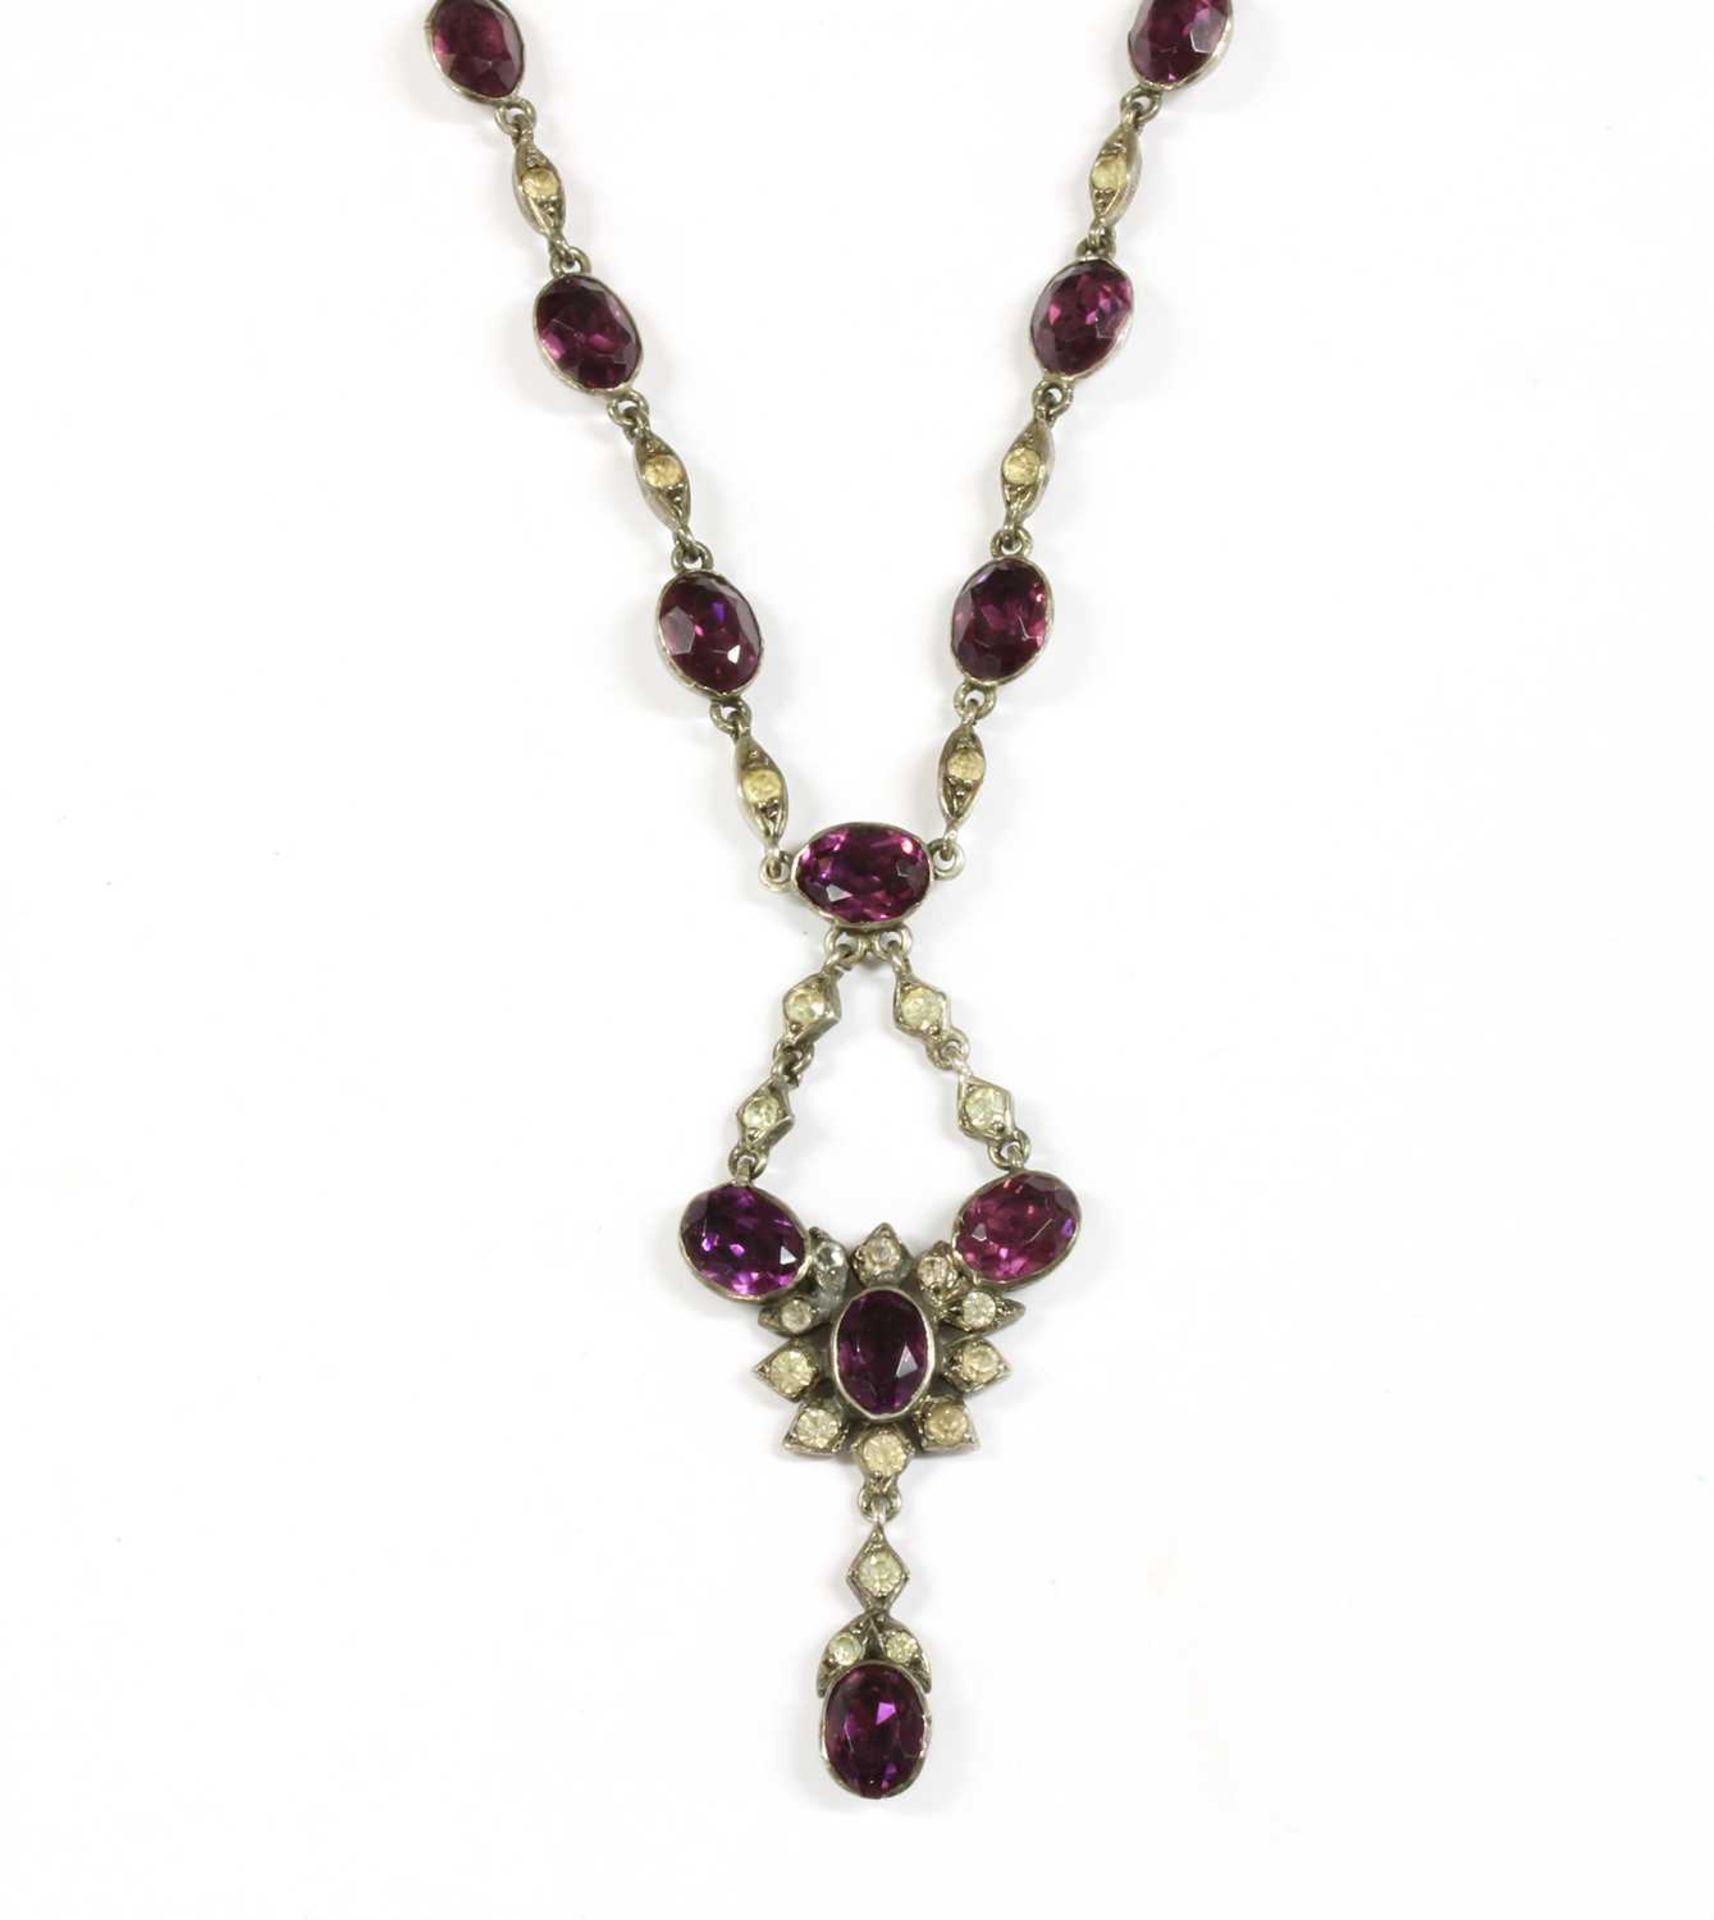 An Edwardian silver purple and white paste pendant,